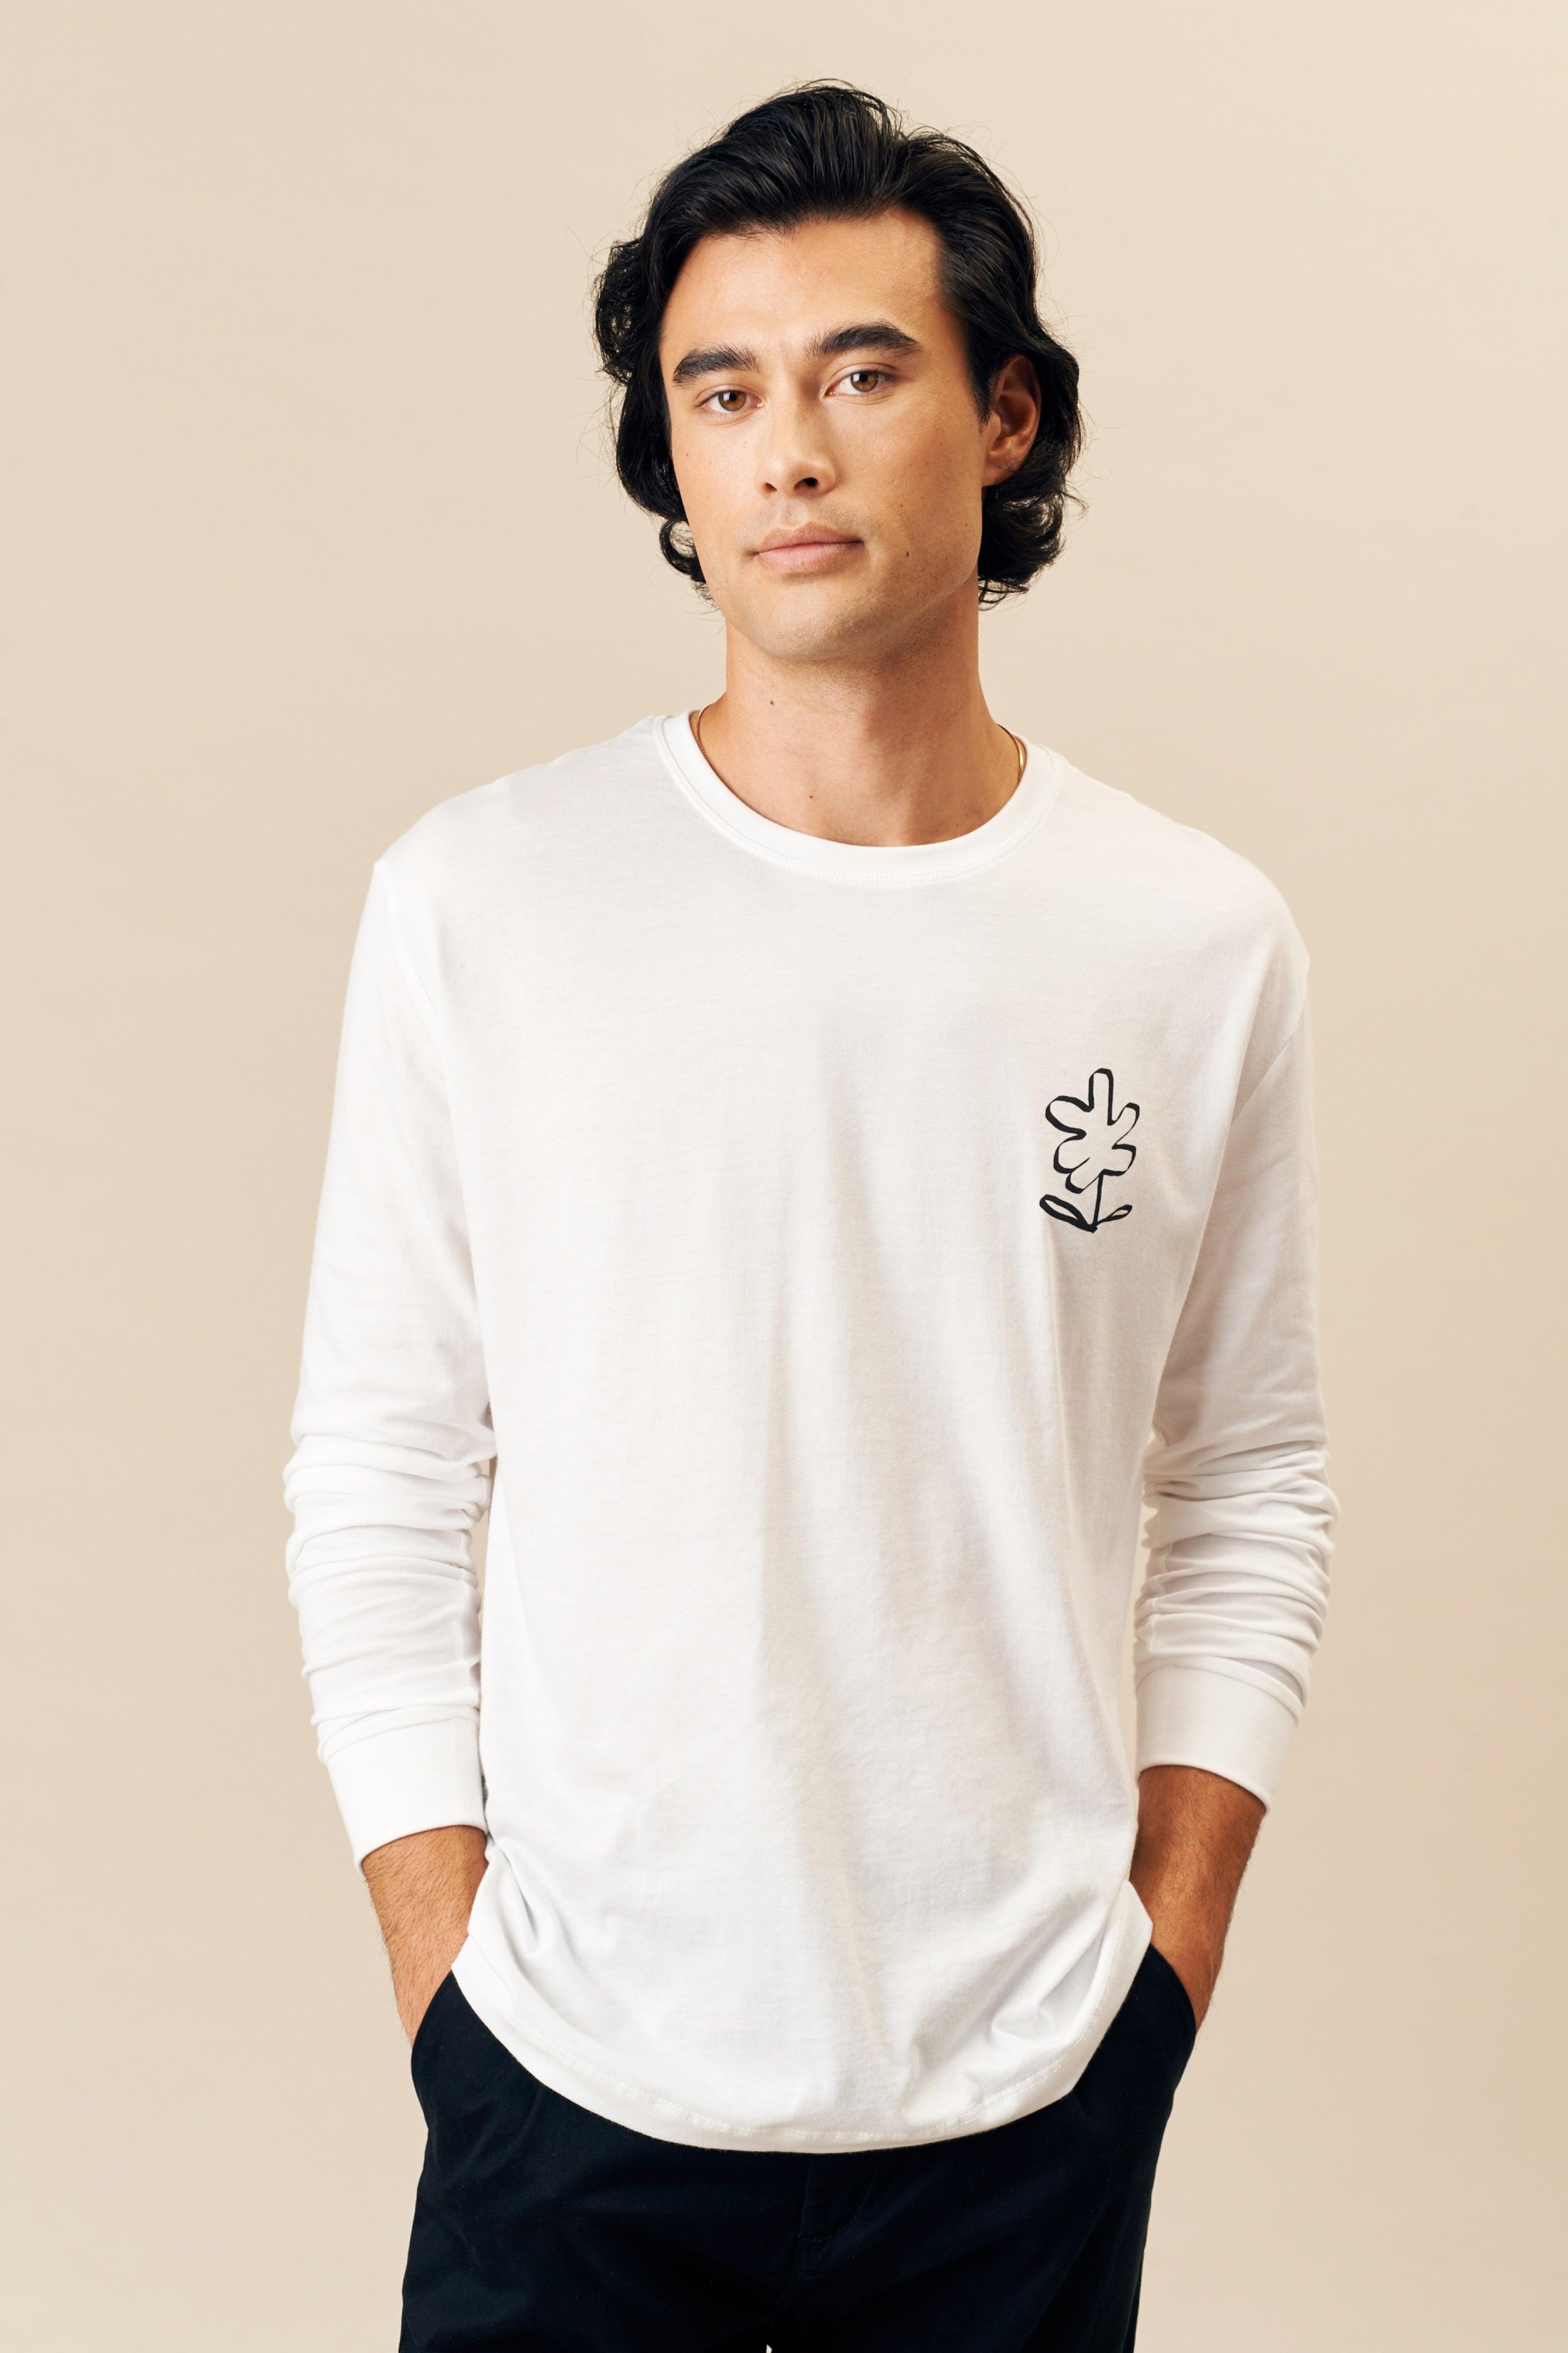 Kotn Unisex Helping Hands Longsleeve Shirt in White, Size Medium, 100% Egyptian Cotton